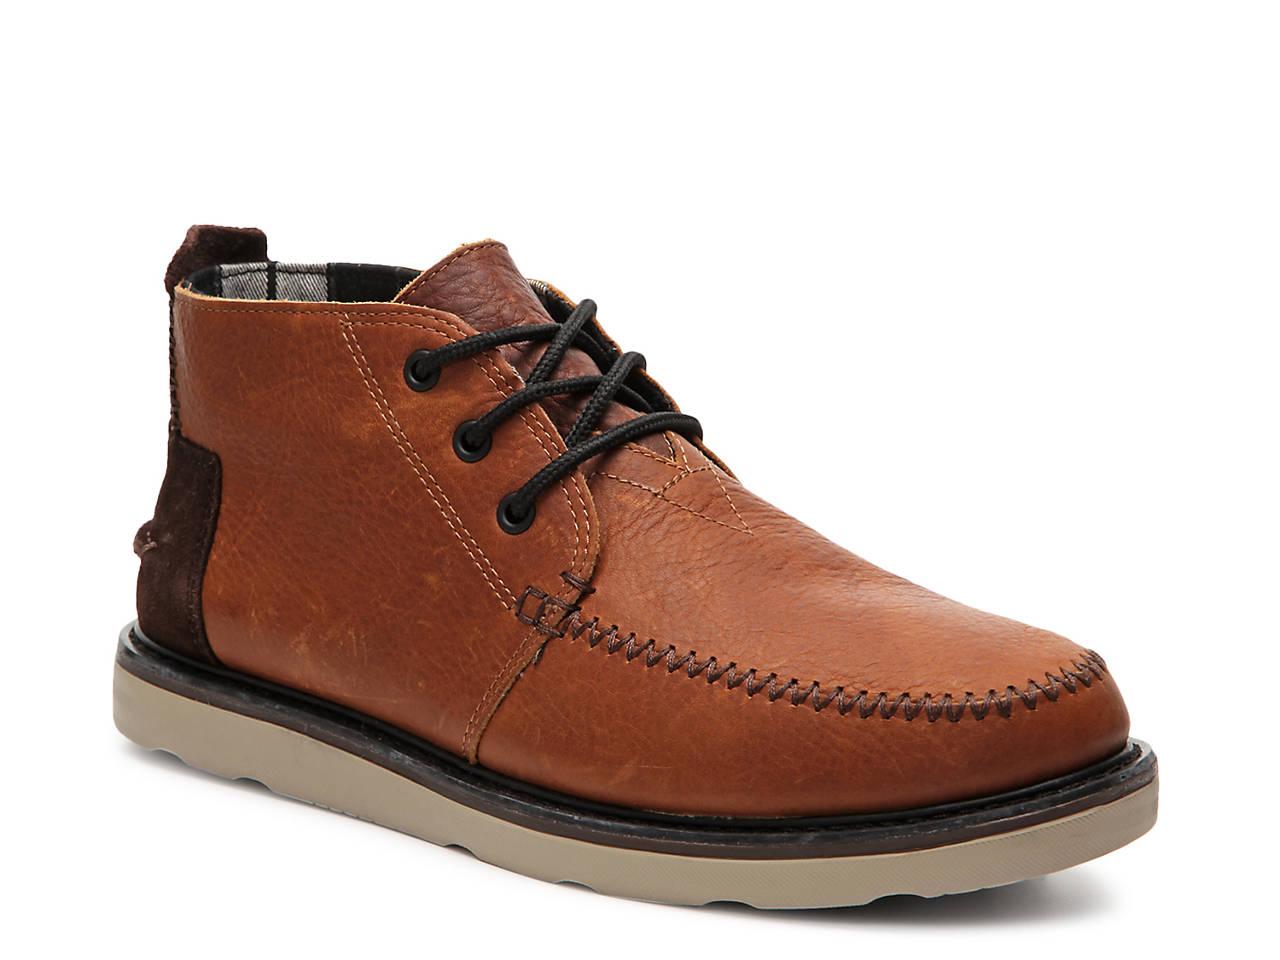 98457b64aa0 TOMS Lea Chukka Boot Men's Shoes | DSW